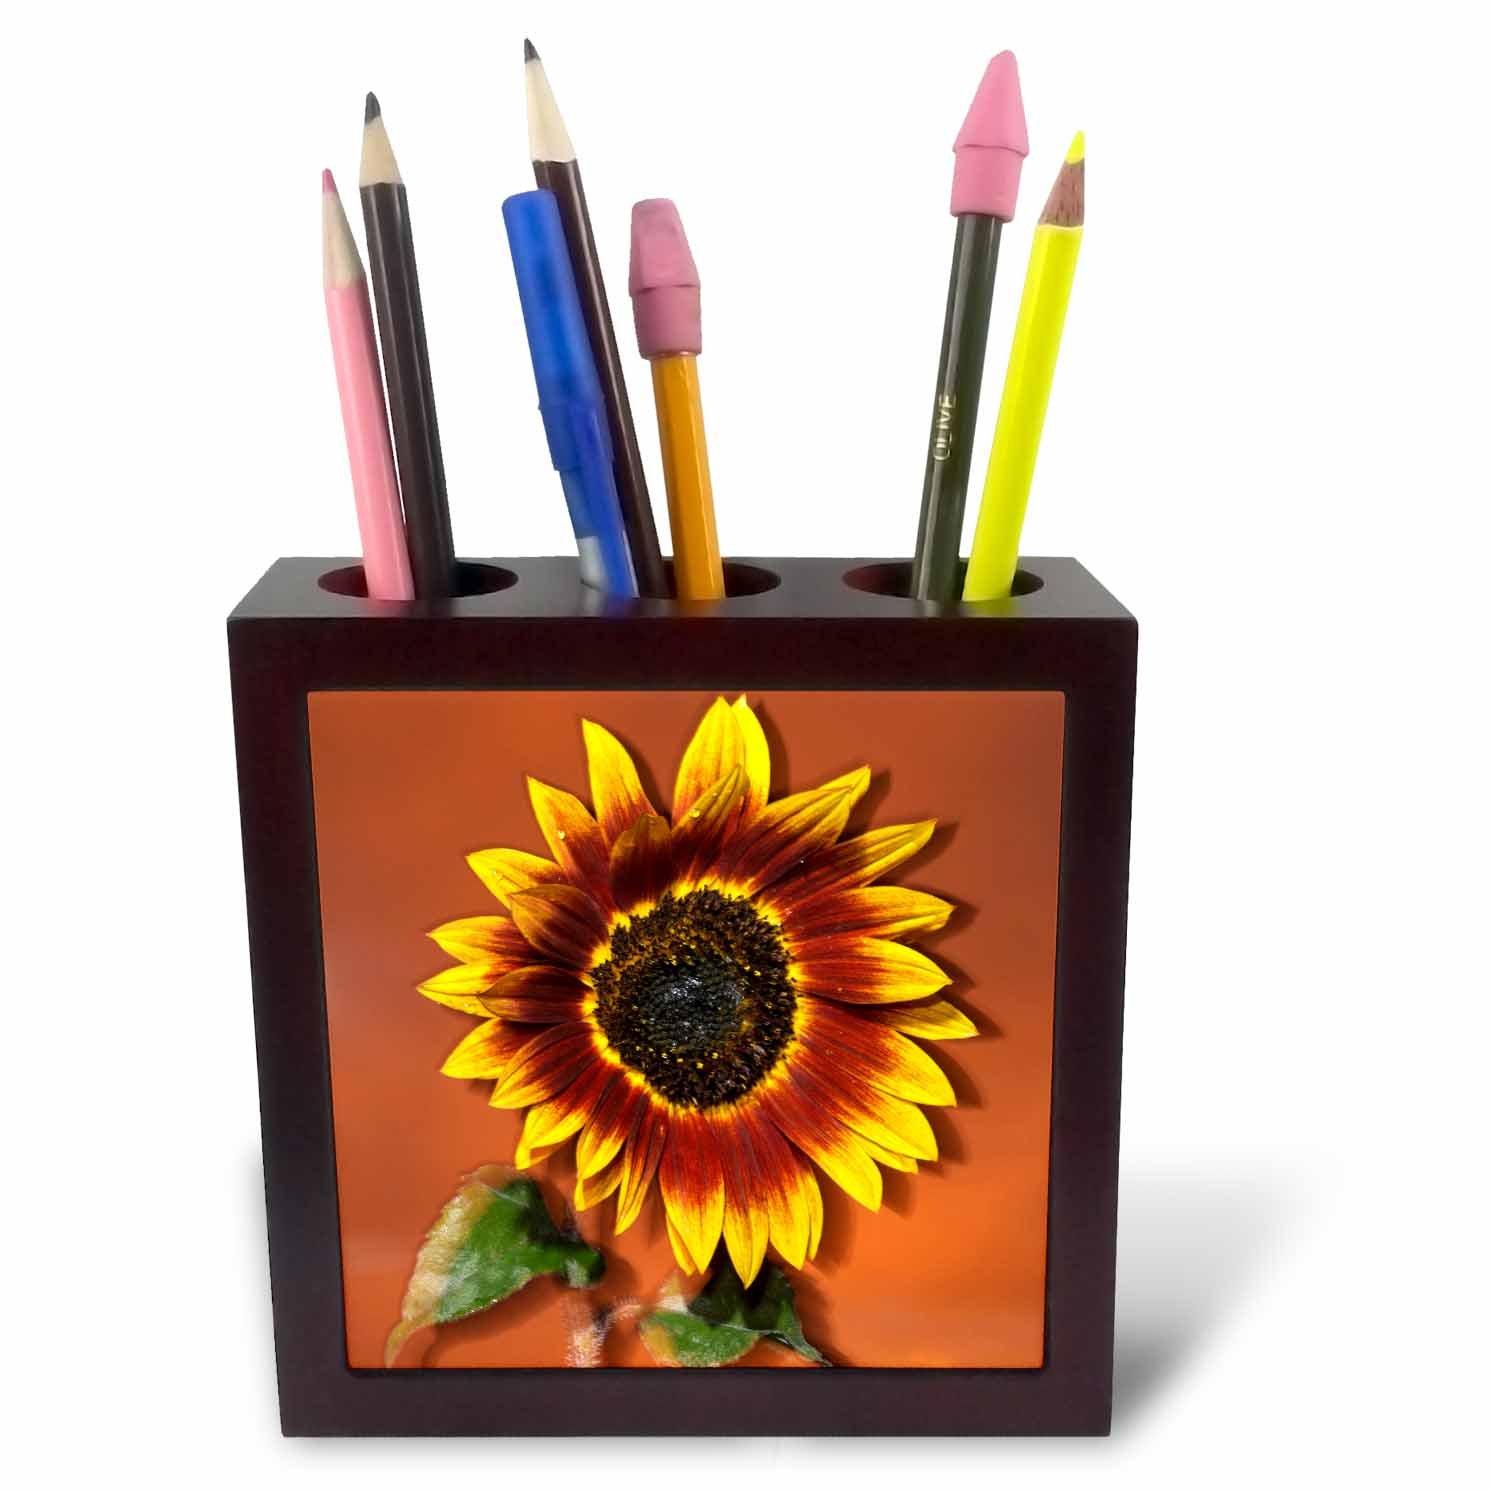 Hybrid Sunflower Jaynes Gallery Tile Pen Holder 3dRose ph/_88162/_1 California US05 BJA0039 5-Inch San Diego